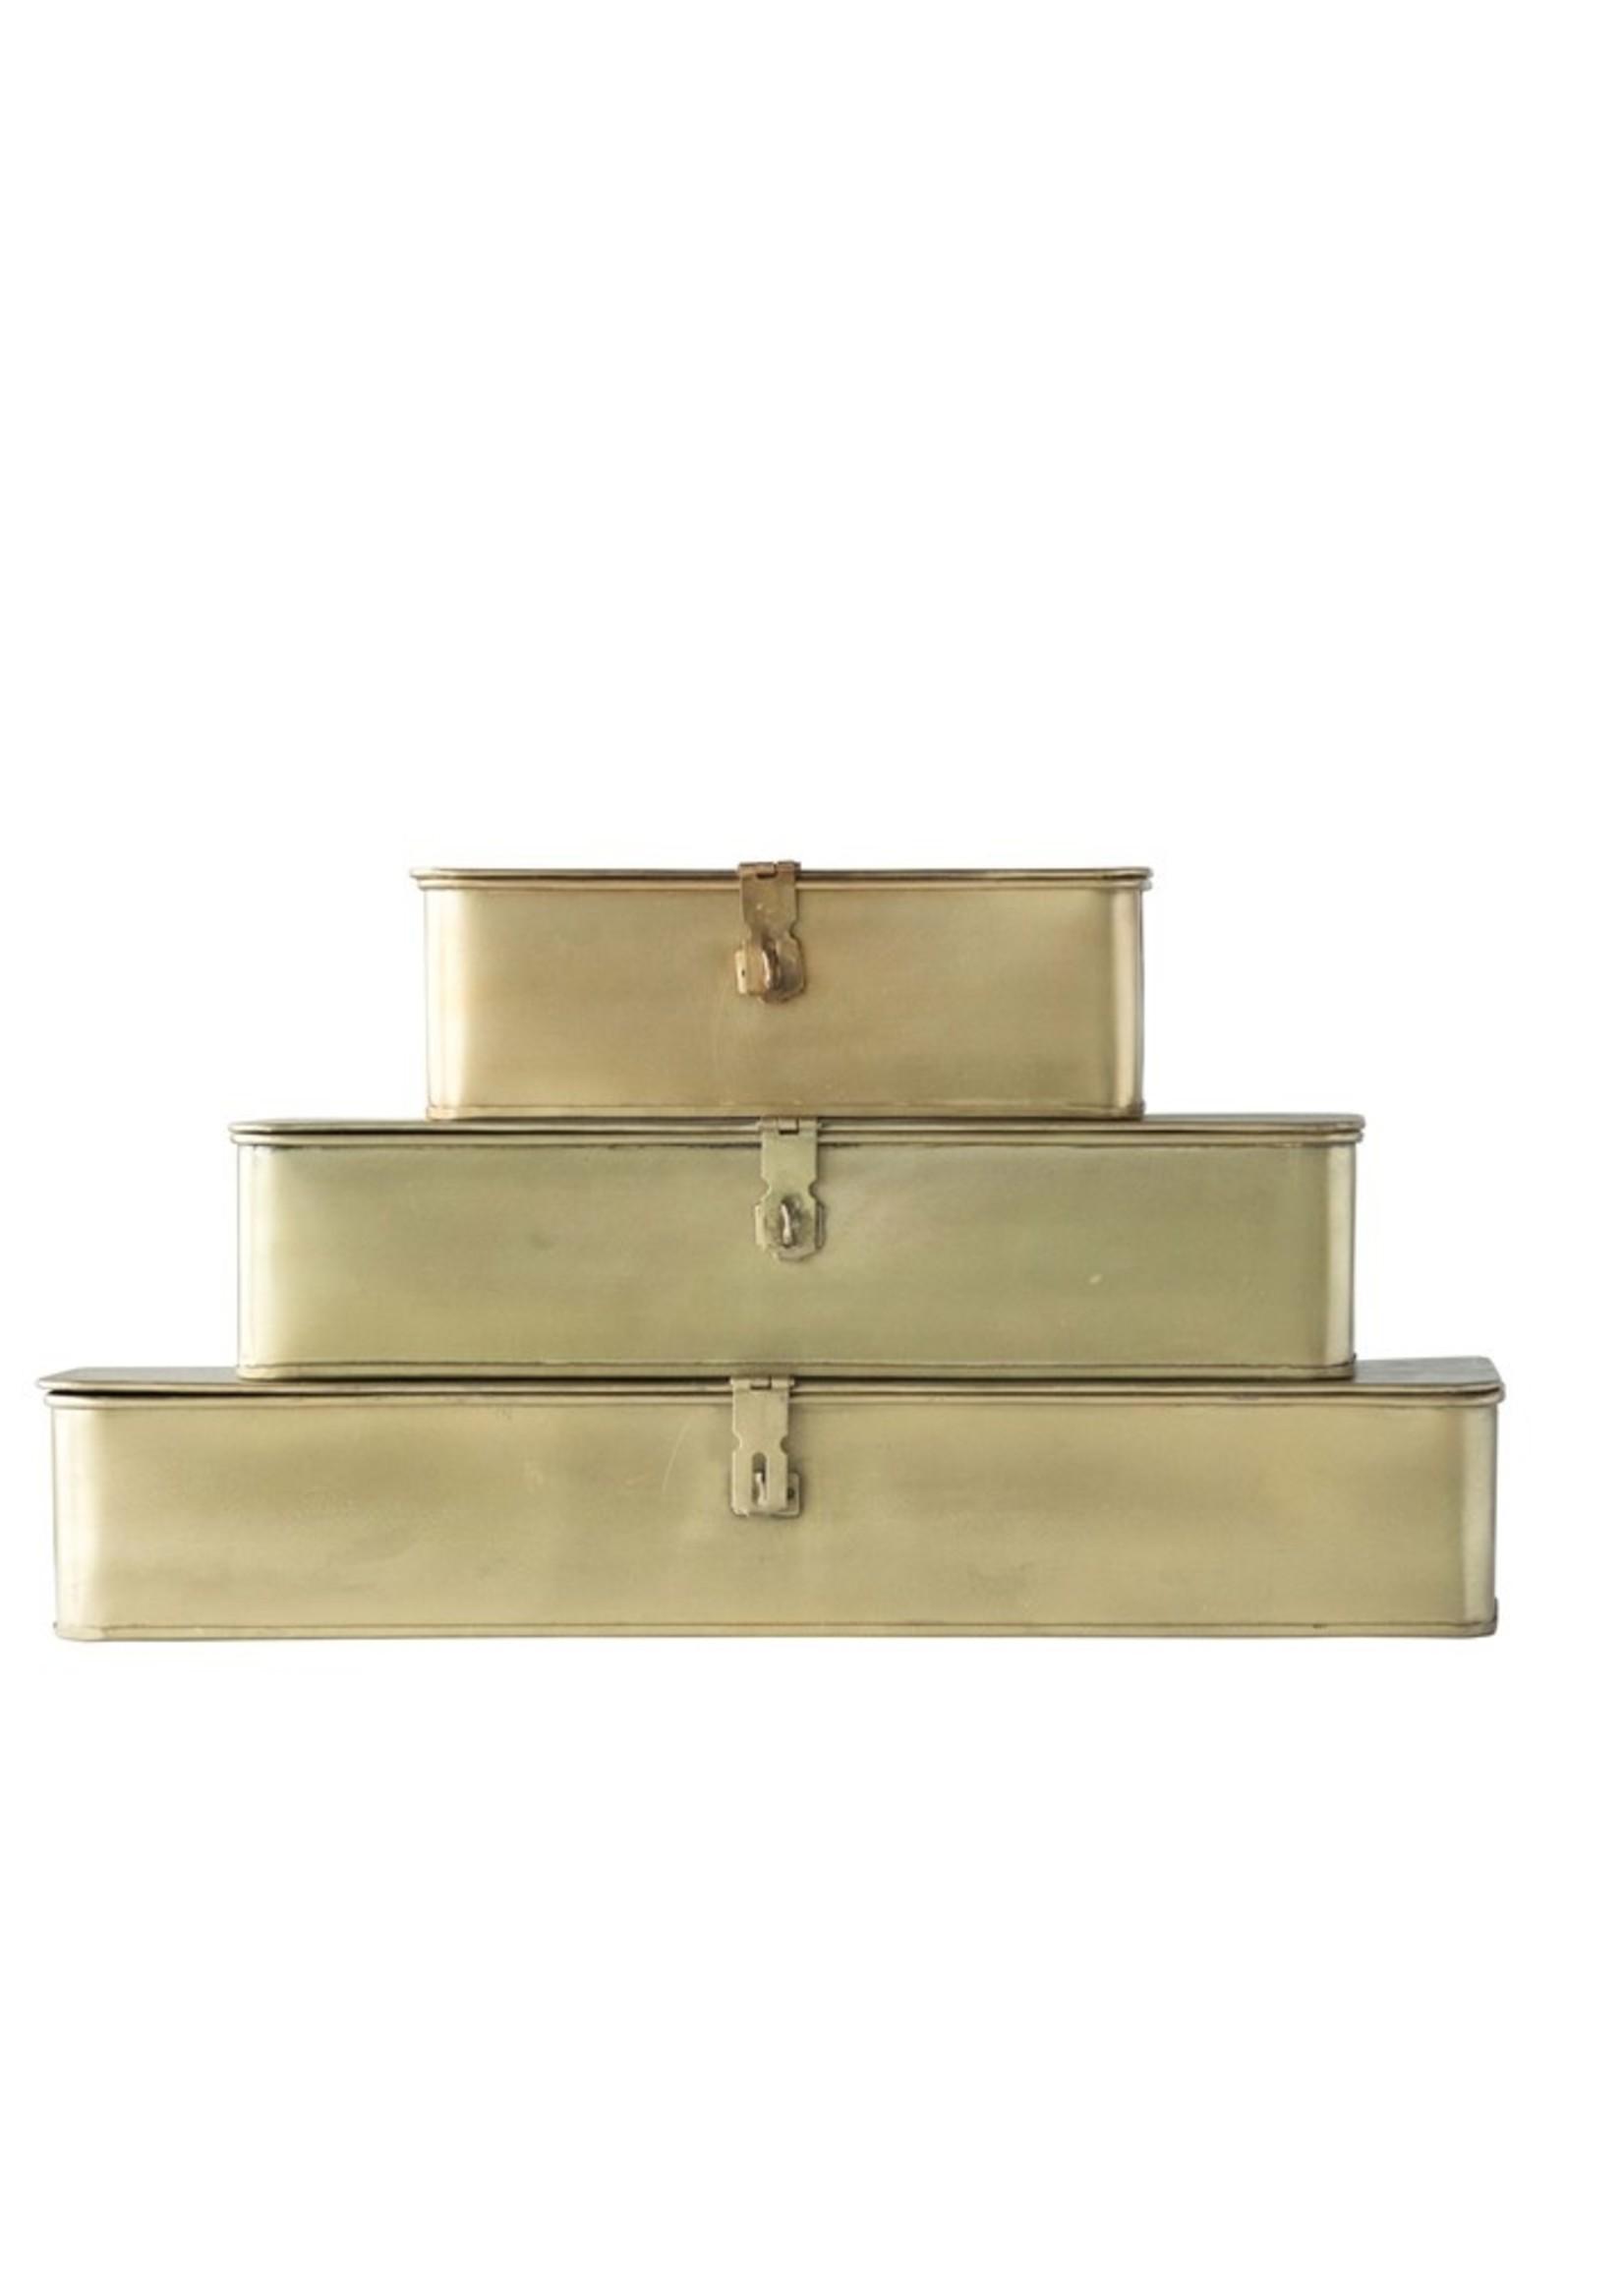 Decorative Metal Boxes, Brass Finish, Set of 3